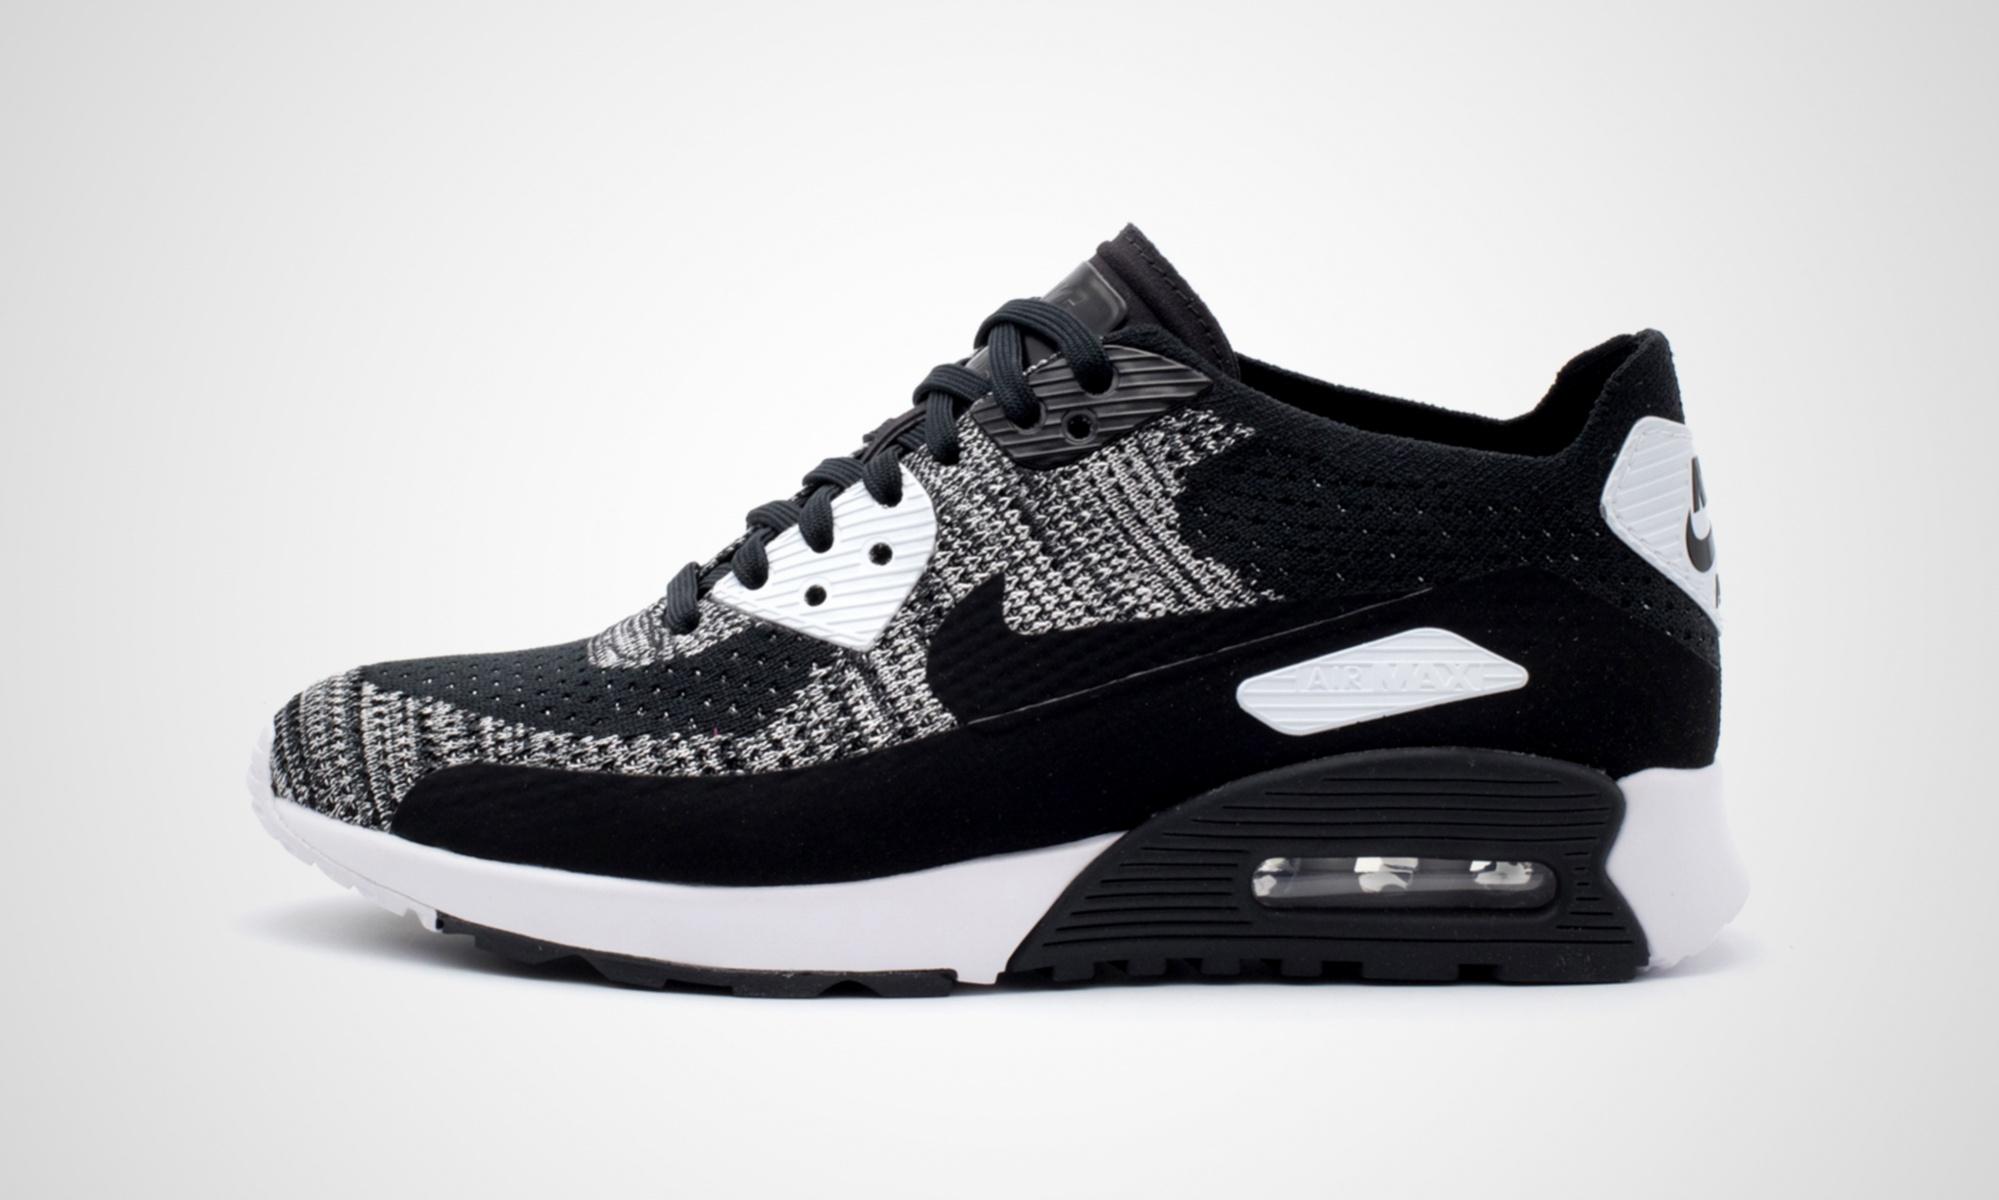 Nike Air Max 90 Ultra 2.0 Flyknit für 82,90 € inkl. Versand (Gr. 36,5 - 41) [The Upper Club]